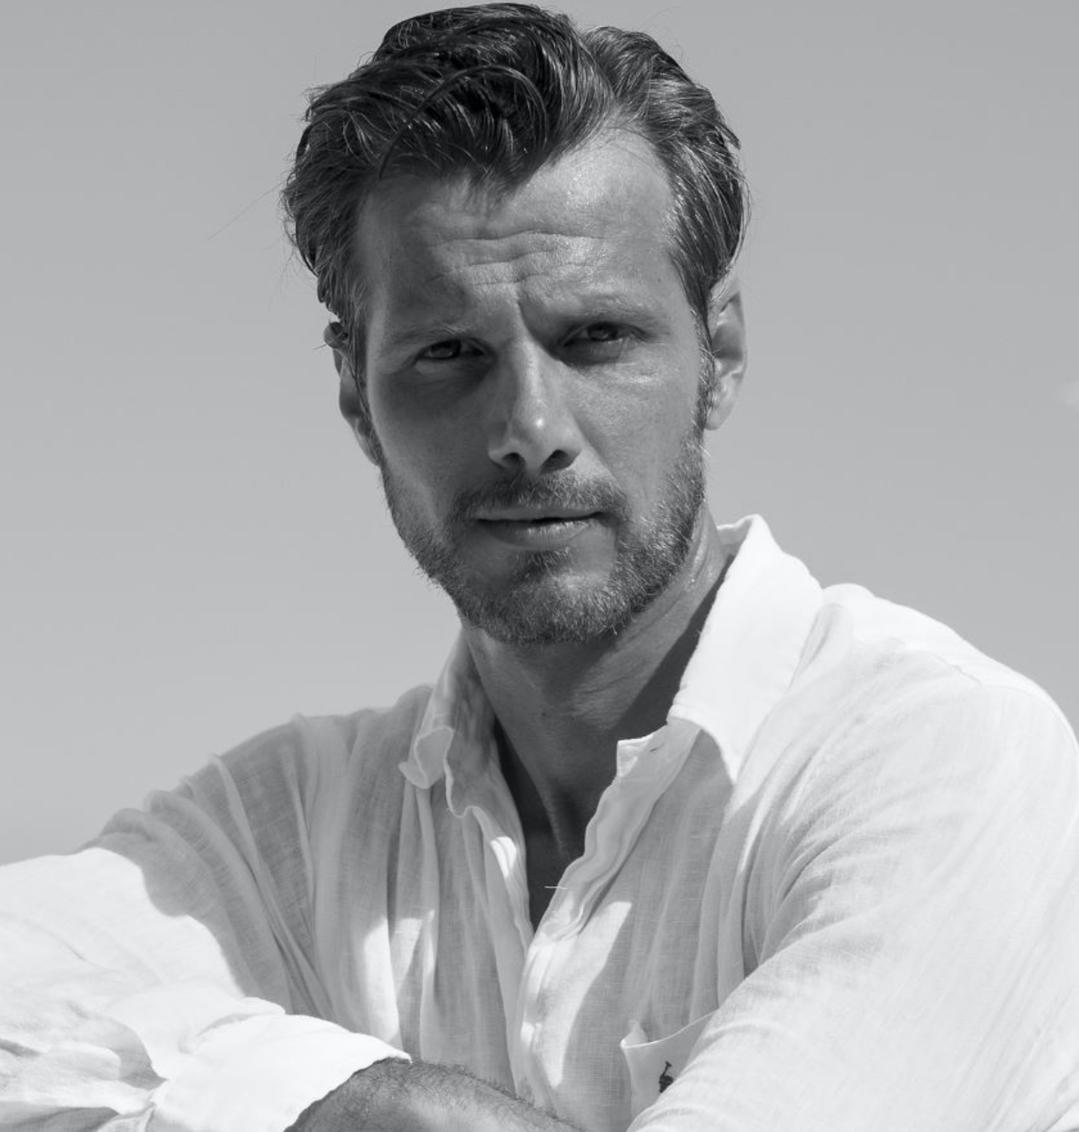 Claudio Avilla - Dn Models